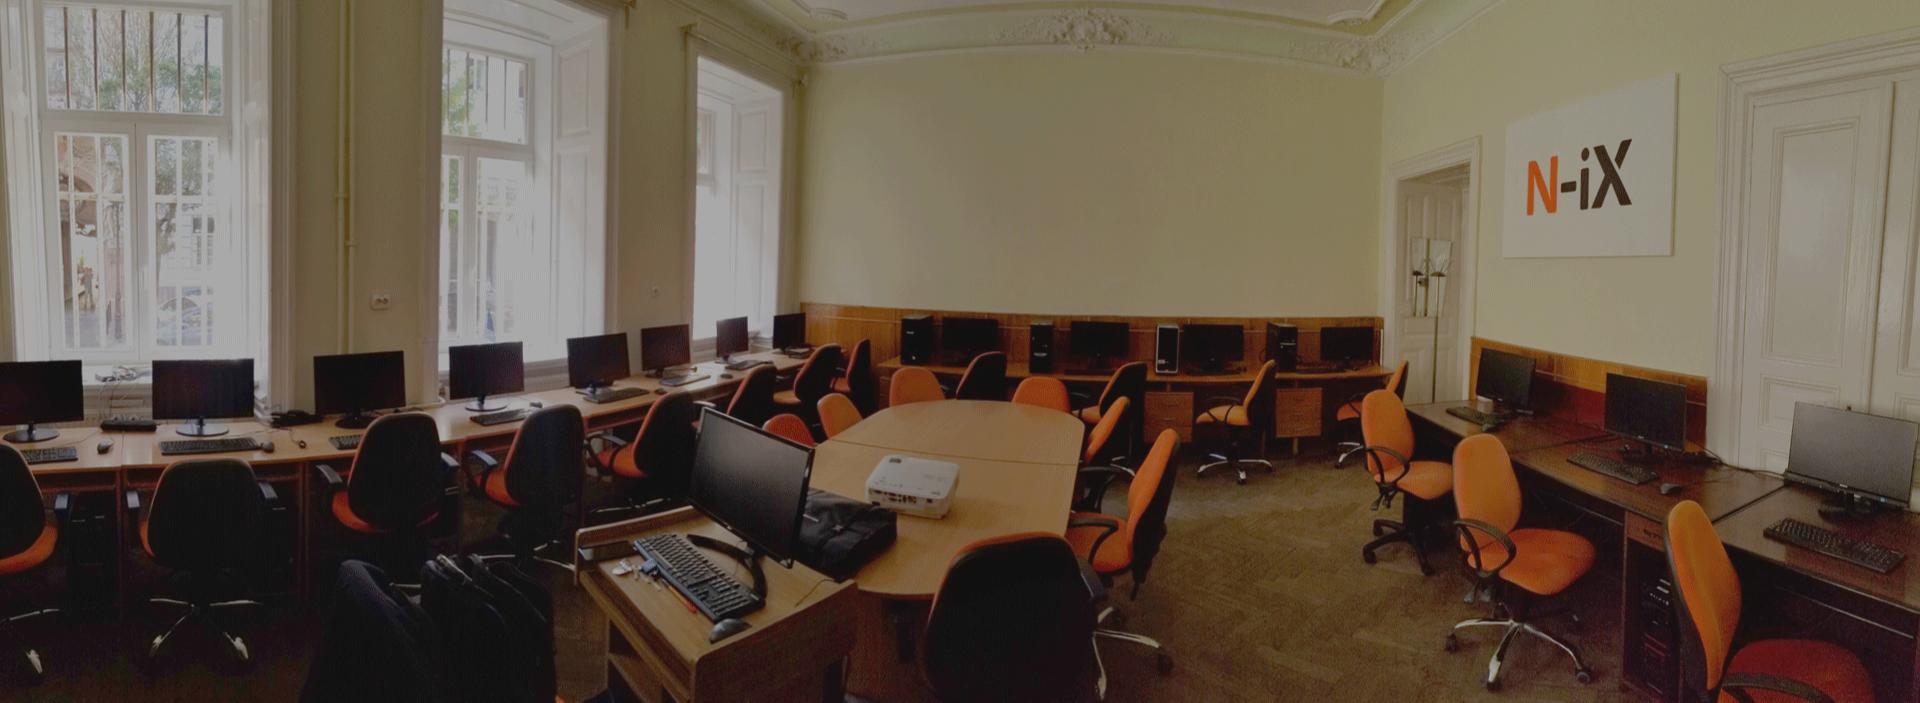 N-iX opens Innovation Labs at Kyiv-Mohyla Academy and Ivan Franko National University of Lviv